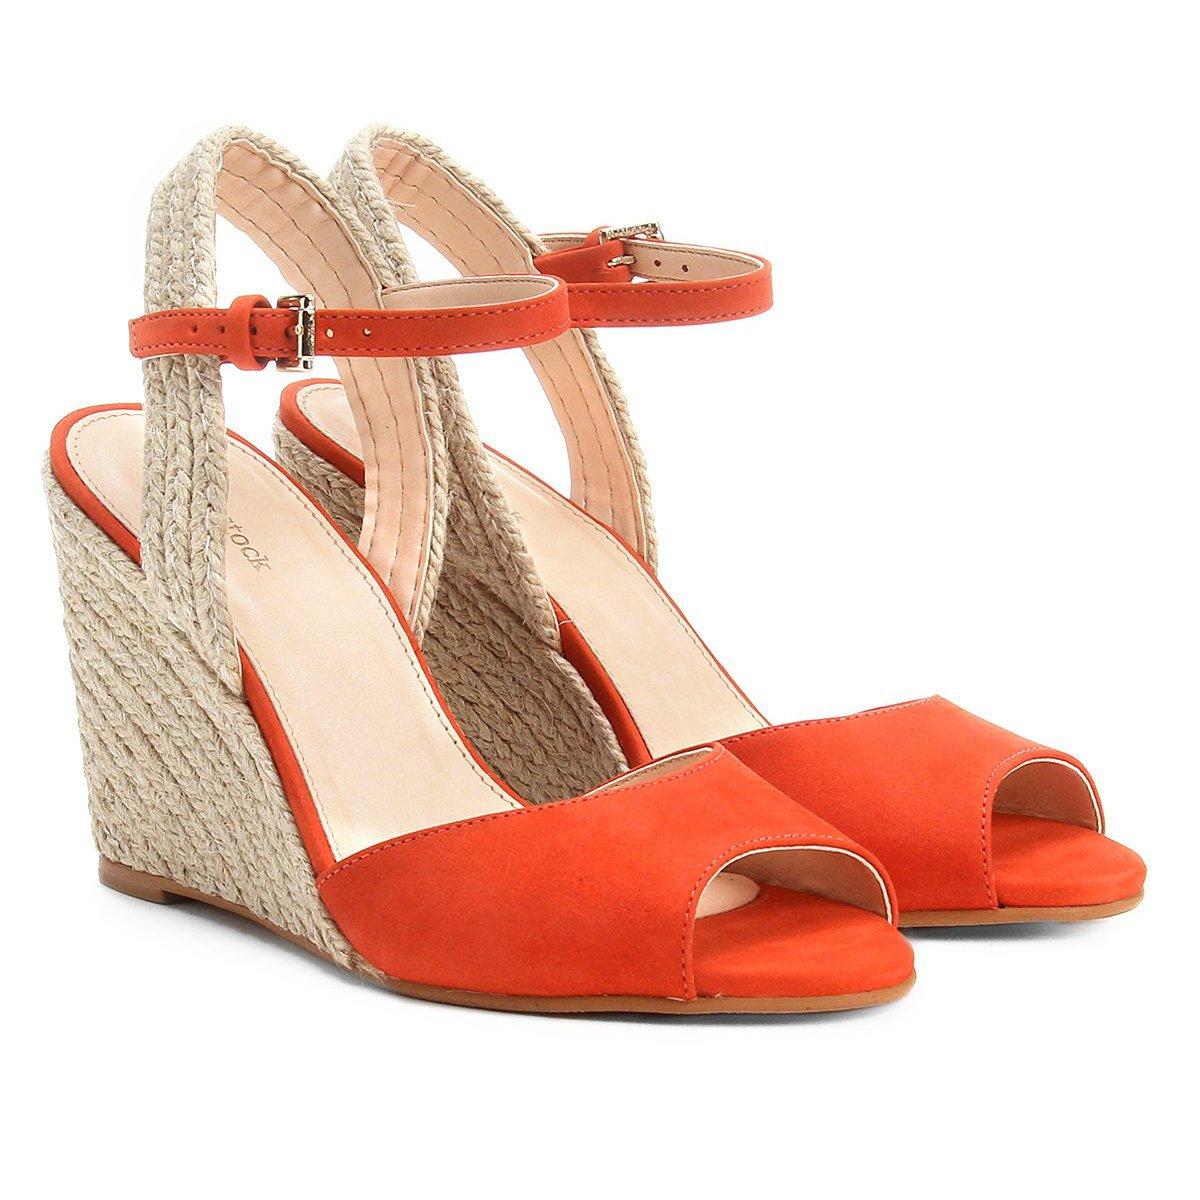 fe13e48e93 Sandália Anabela Couro Shoestock Corda Feminina